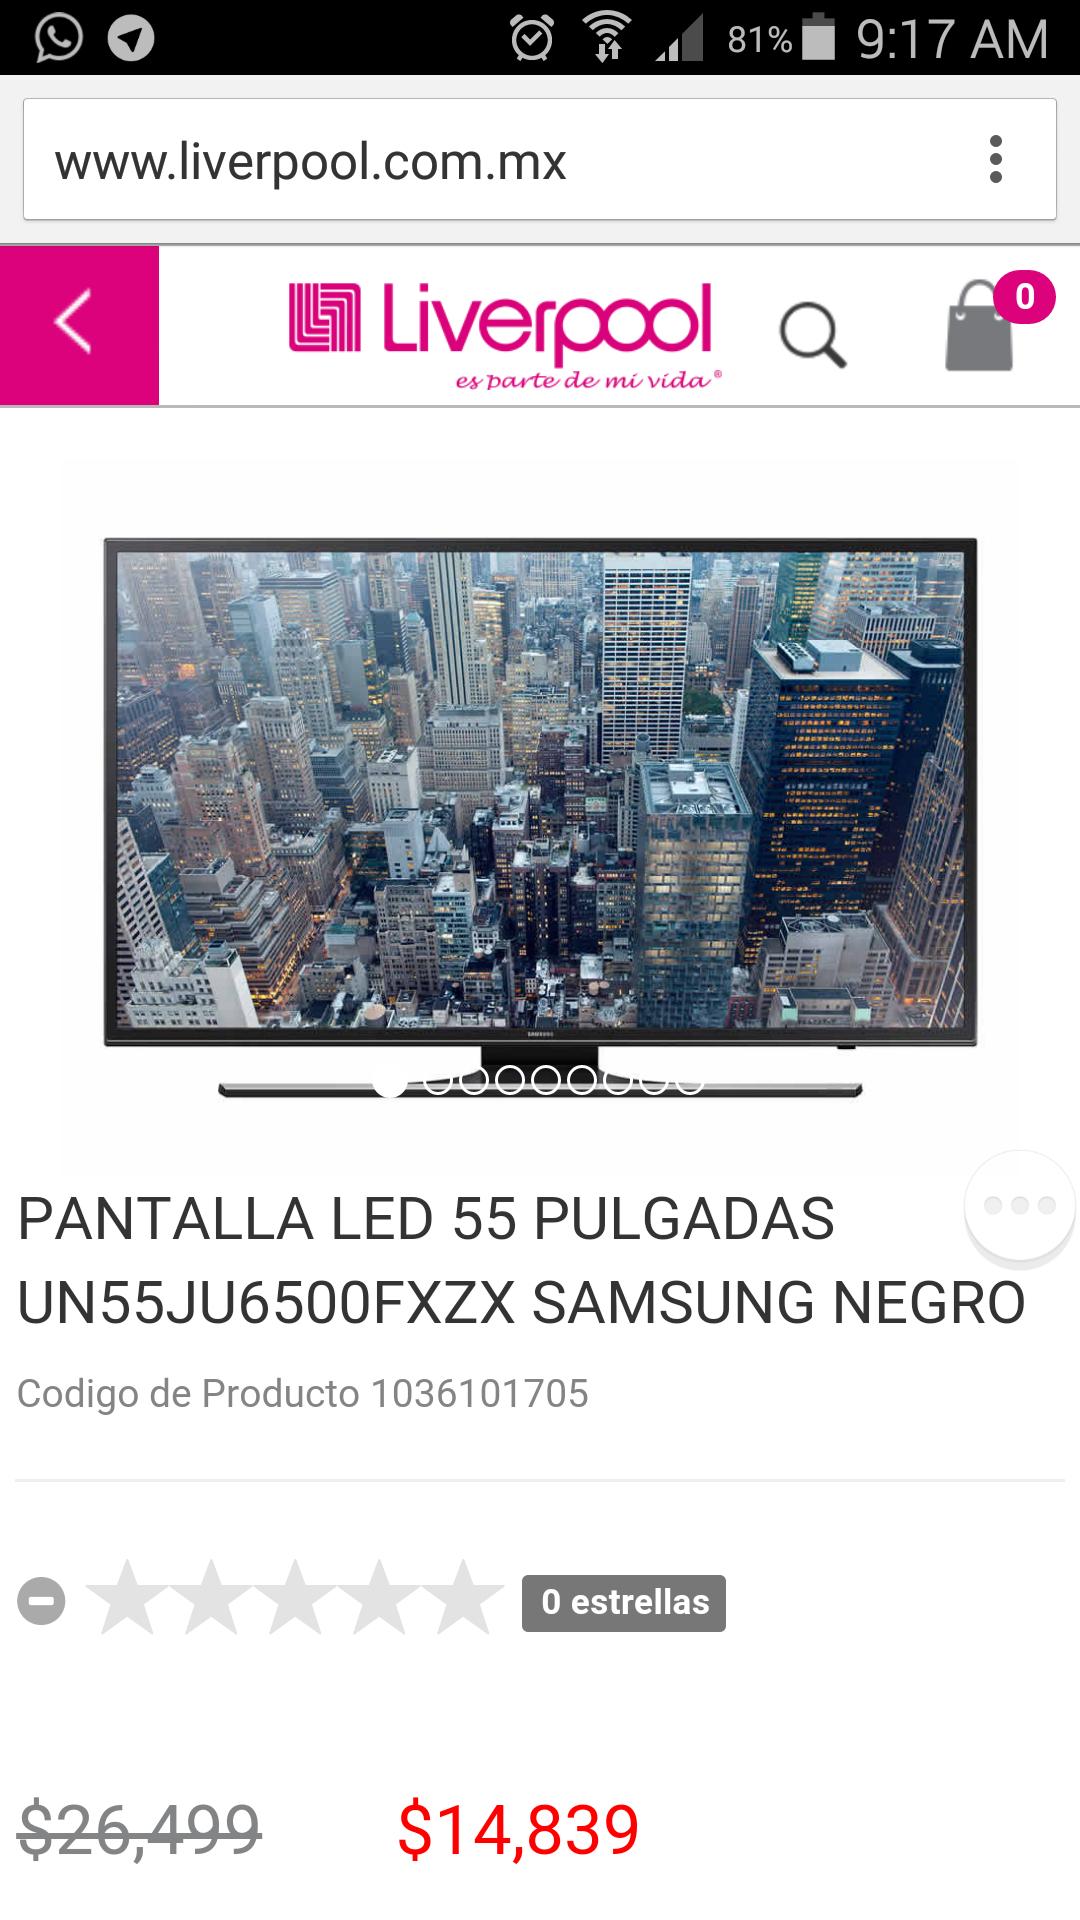 Hotsale 2015 en Liverpool: TV Samsung UHD 55 pulgadas a $14,839